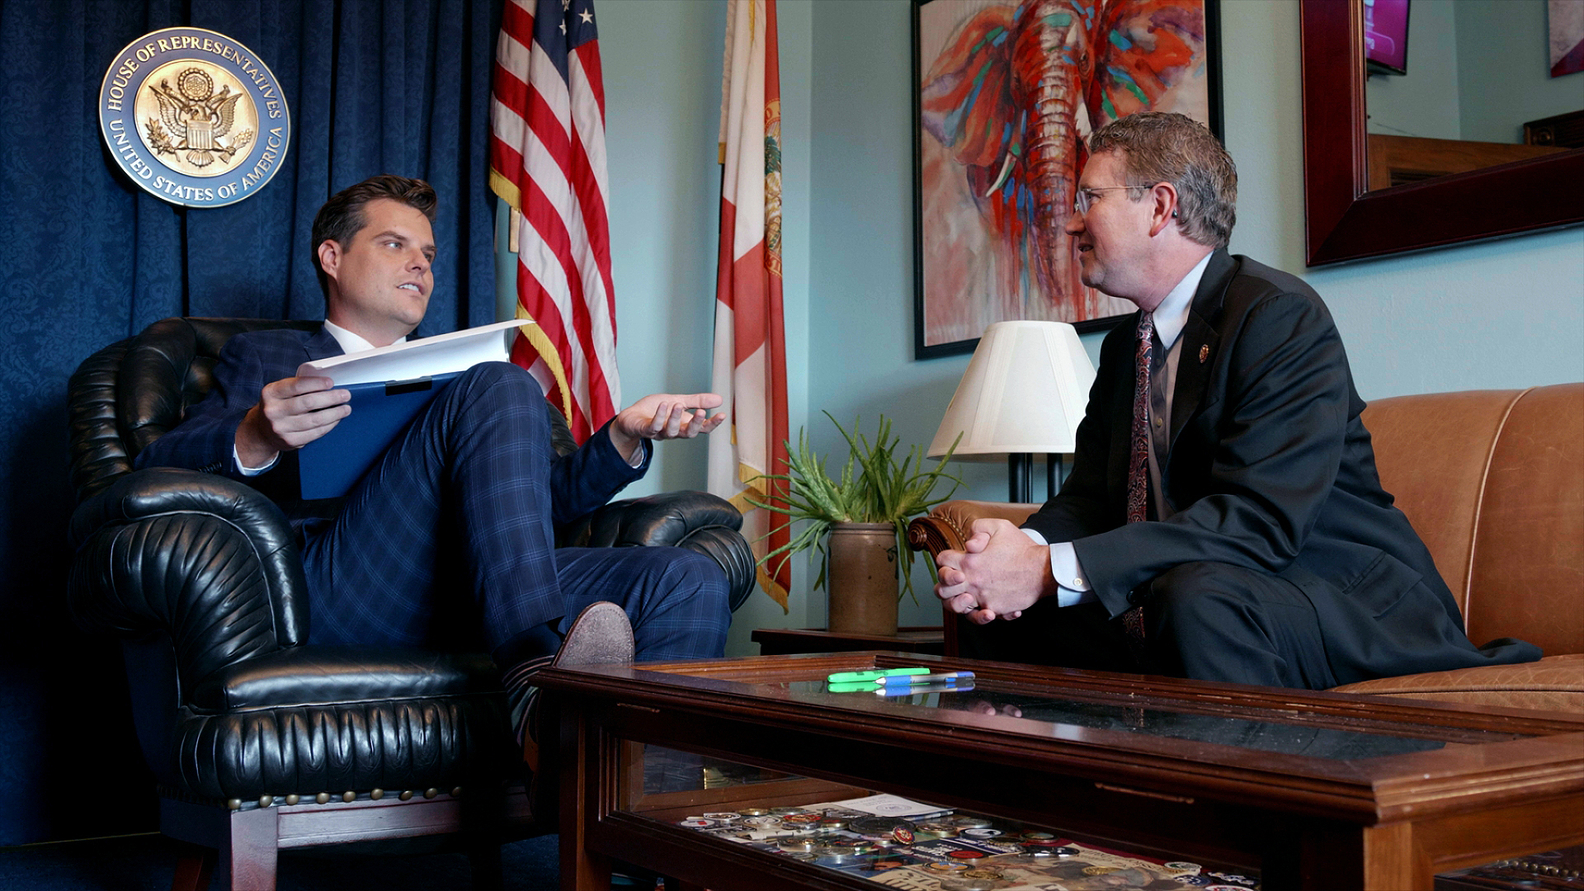 Rep. Matt Gaetz (R-FL) and Rep Thomas Massie (R-KY) talking about fundraising in Gaetz's office